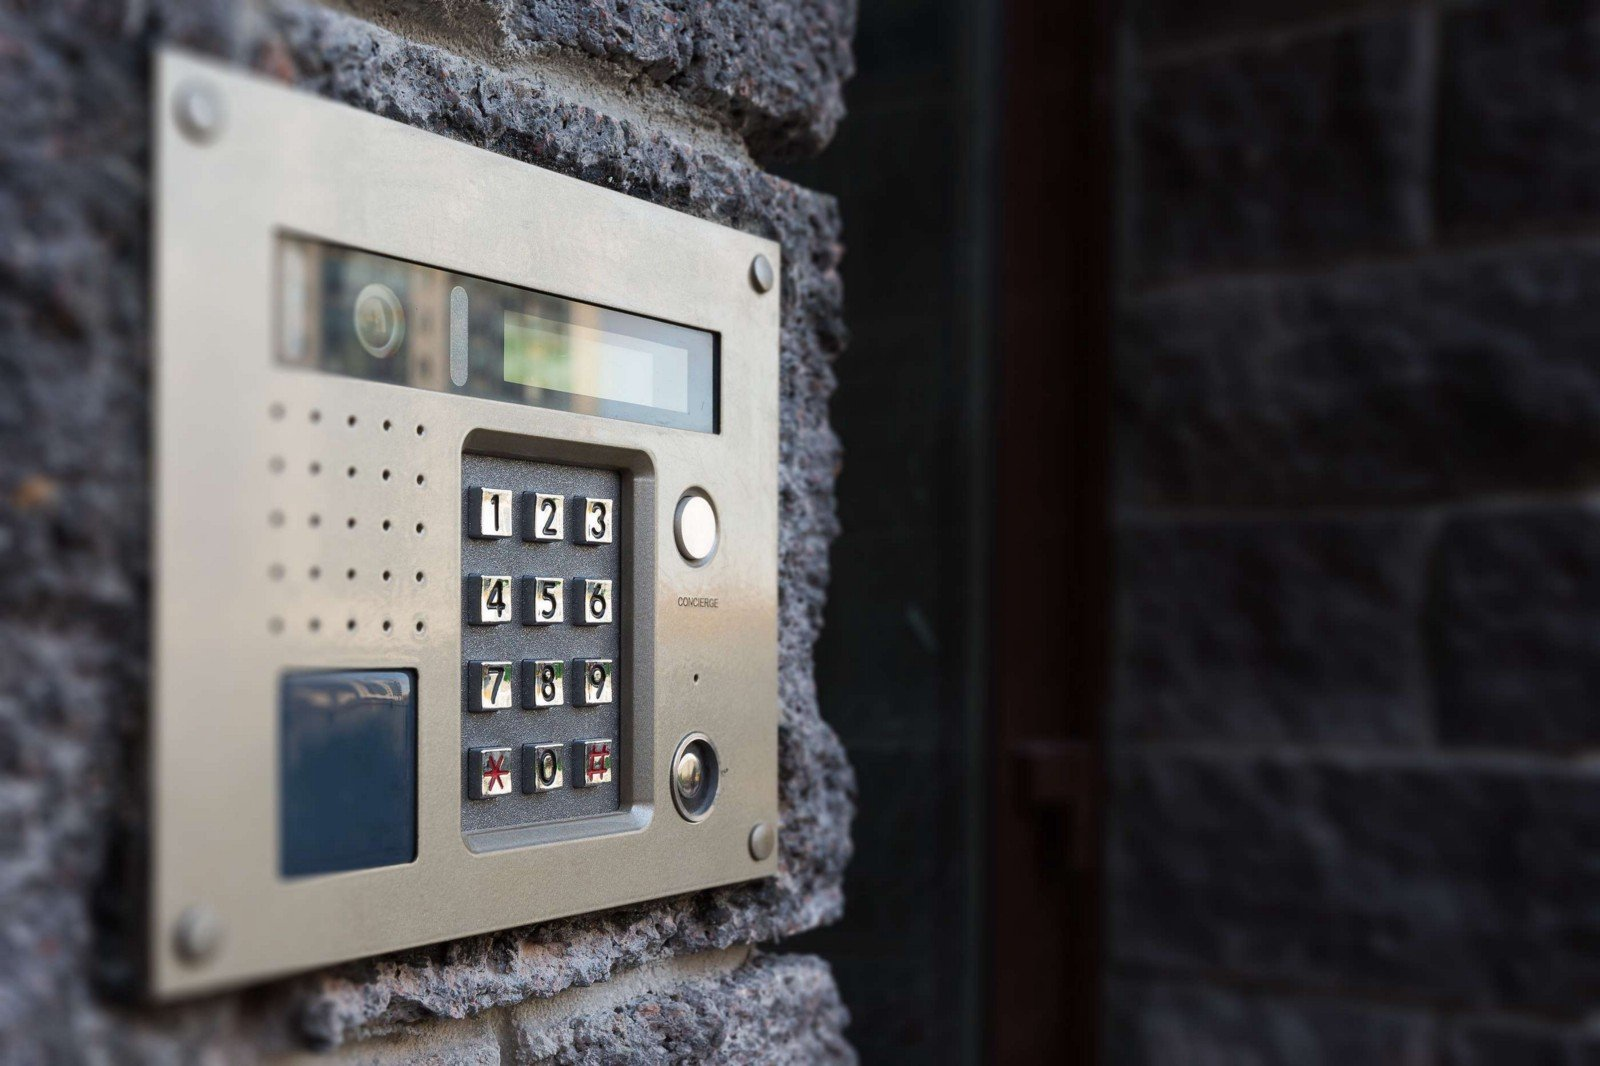 Security & Intercom Systems